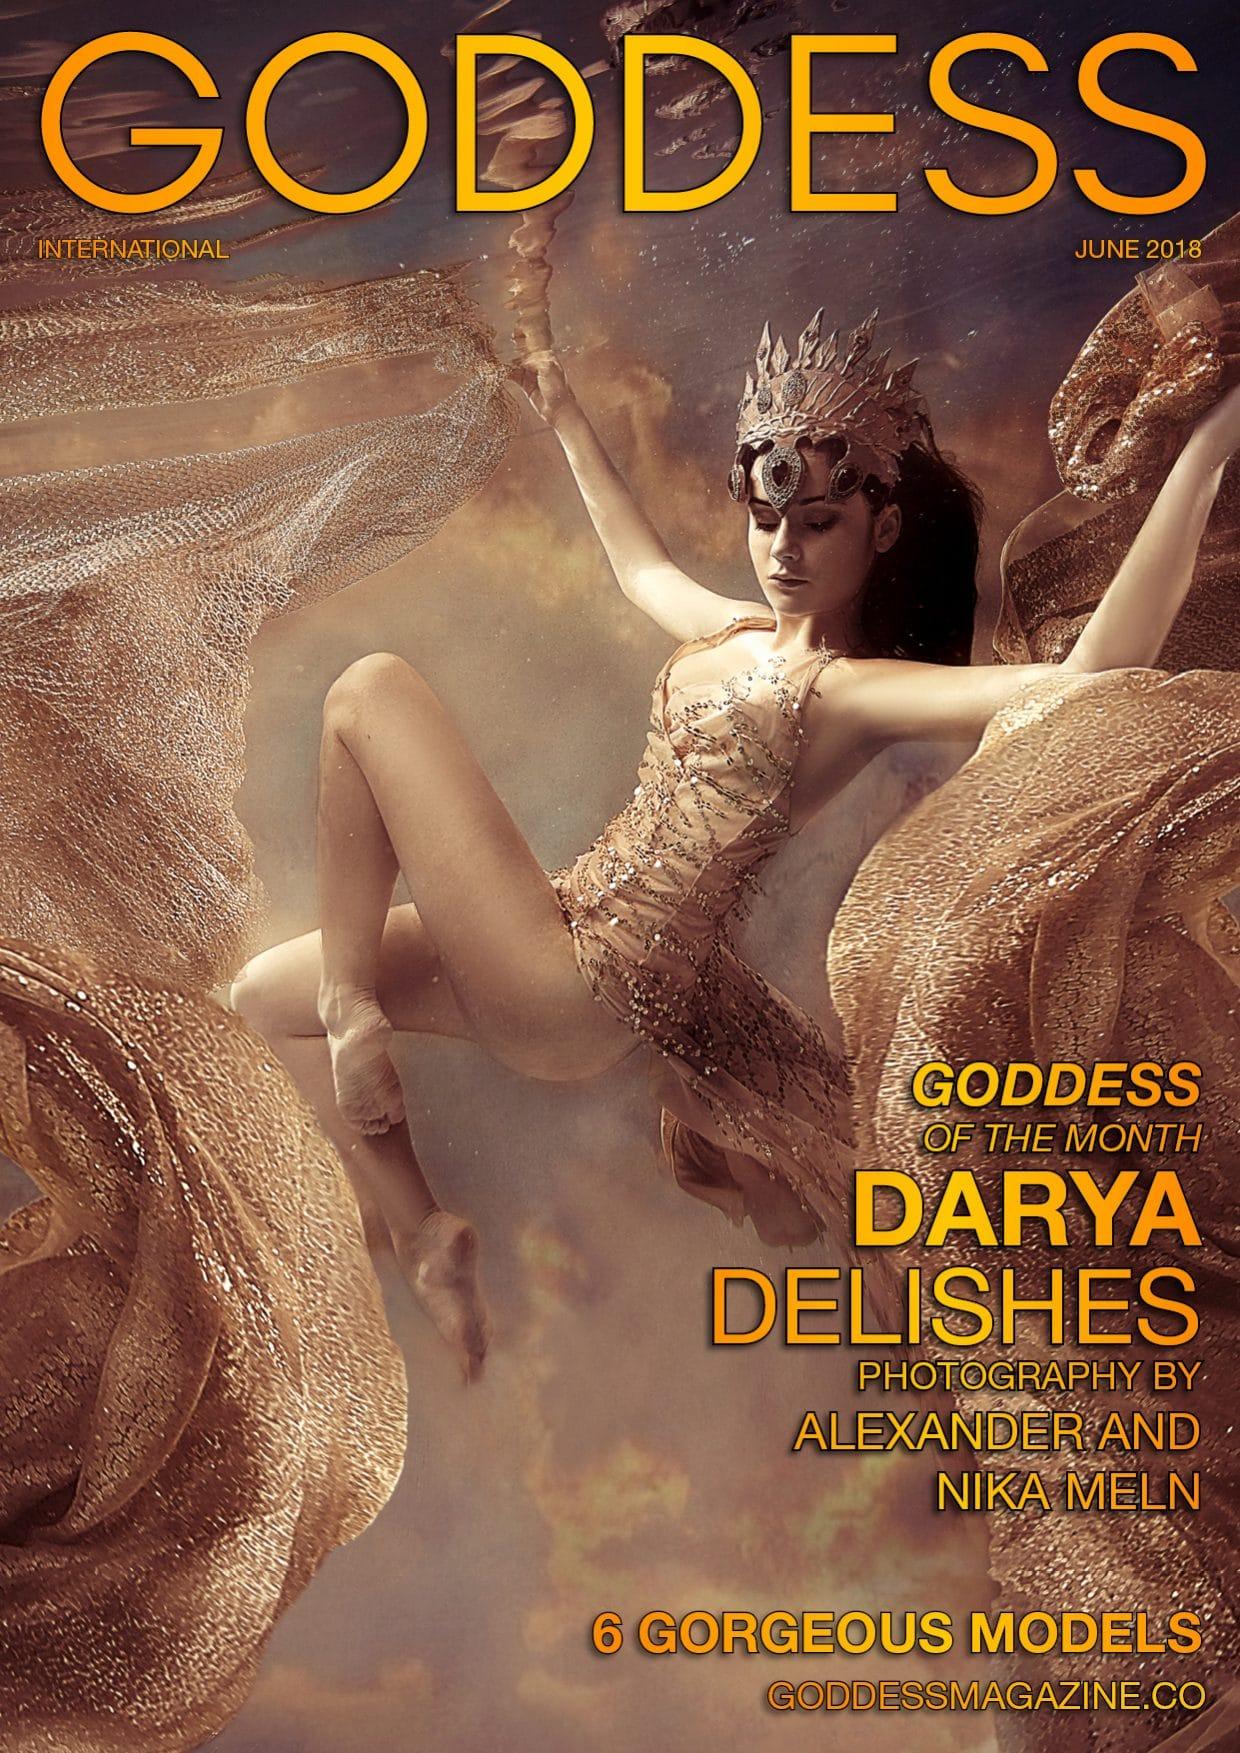 Goddess Magazine – June 2018 – Darya Delishes 1